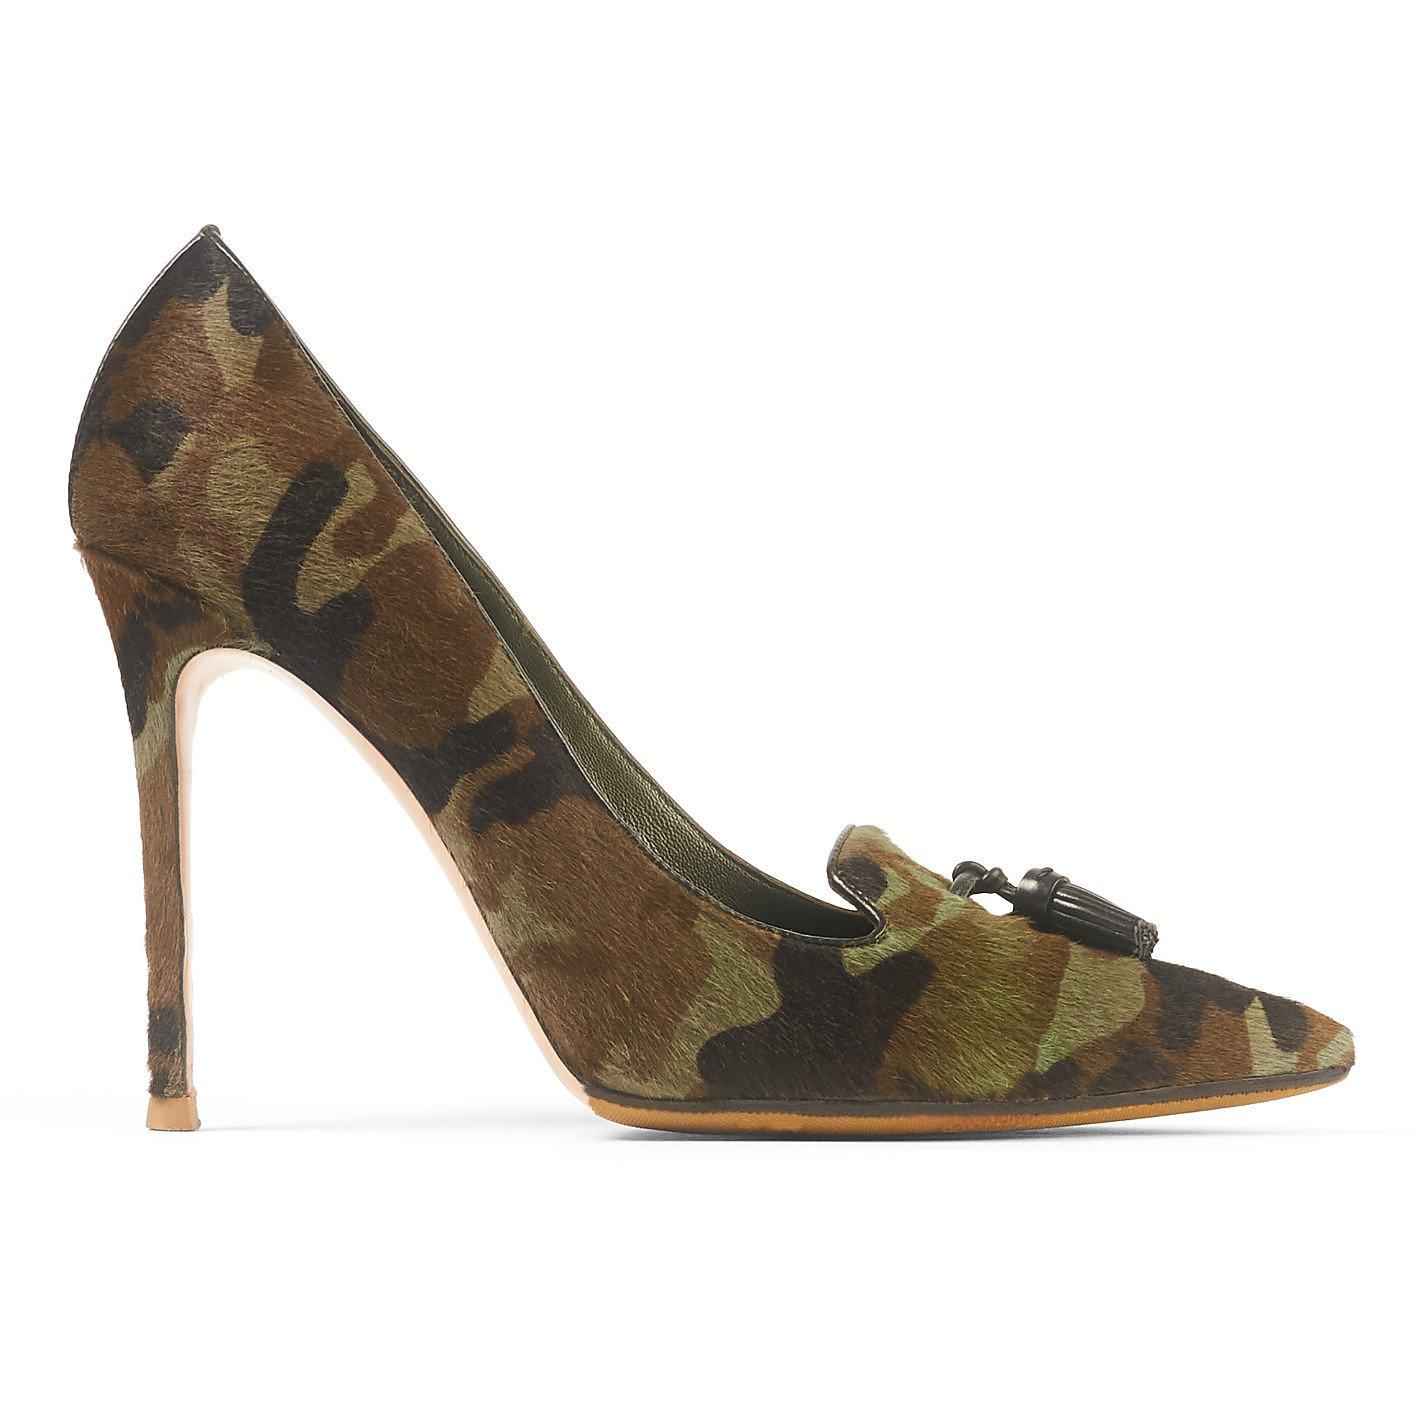 GIANVITO ROSSI Camouflage Print Stiletto Heels